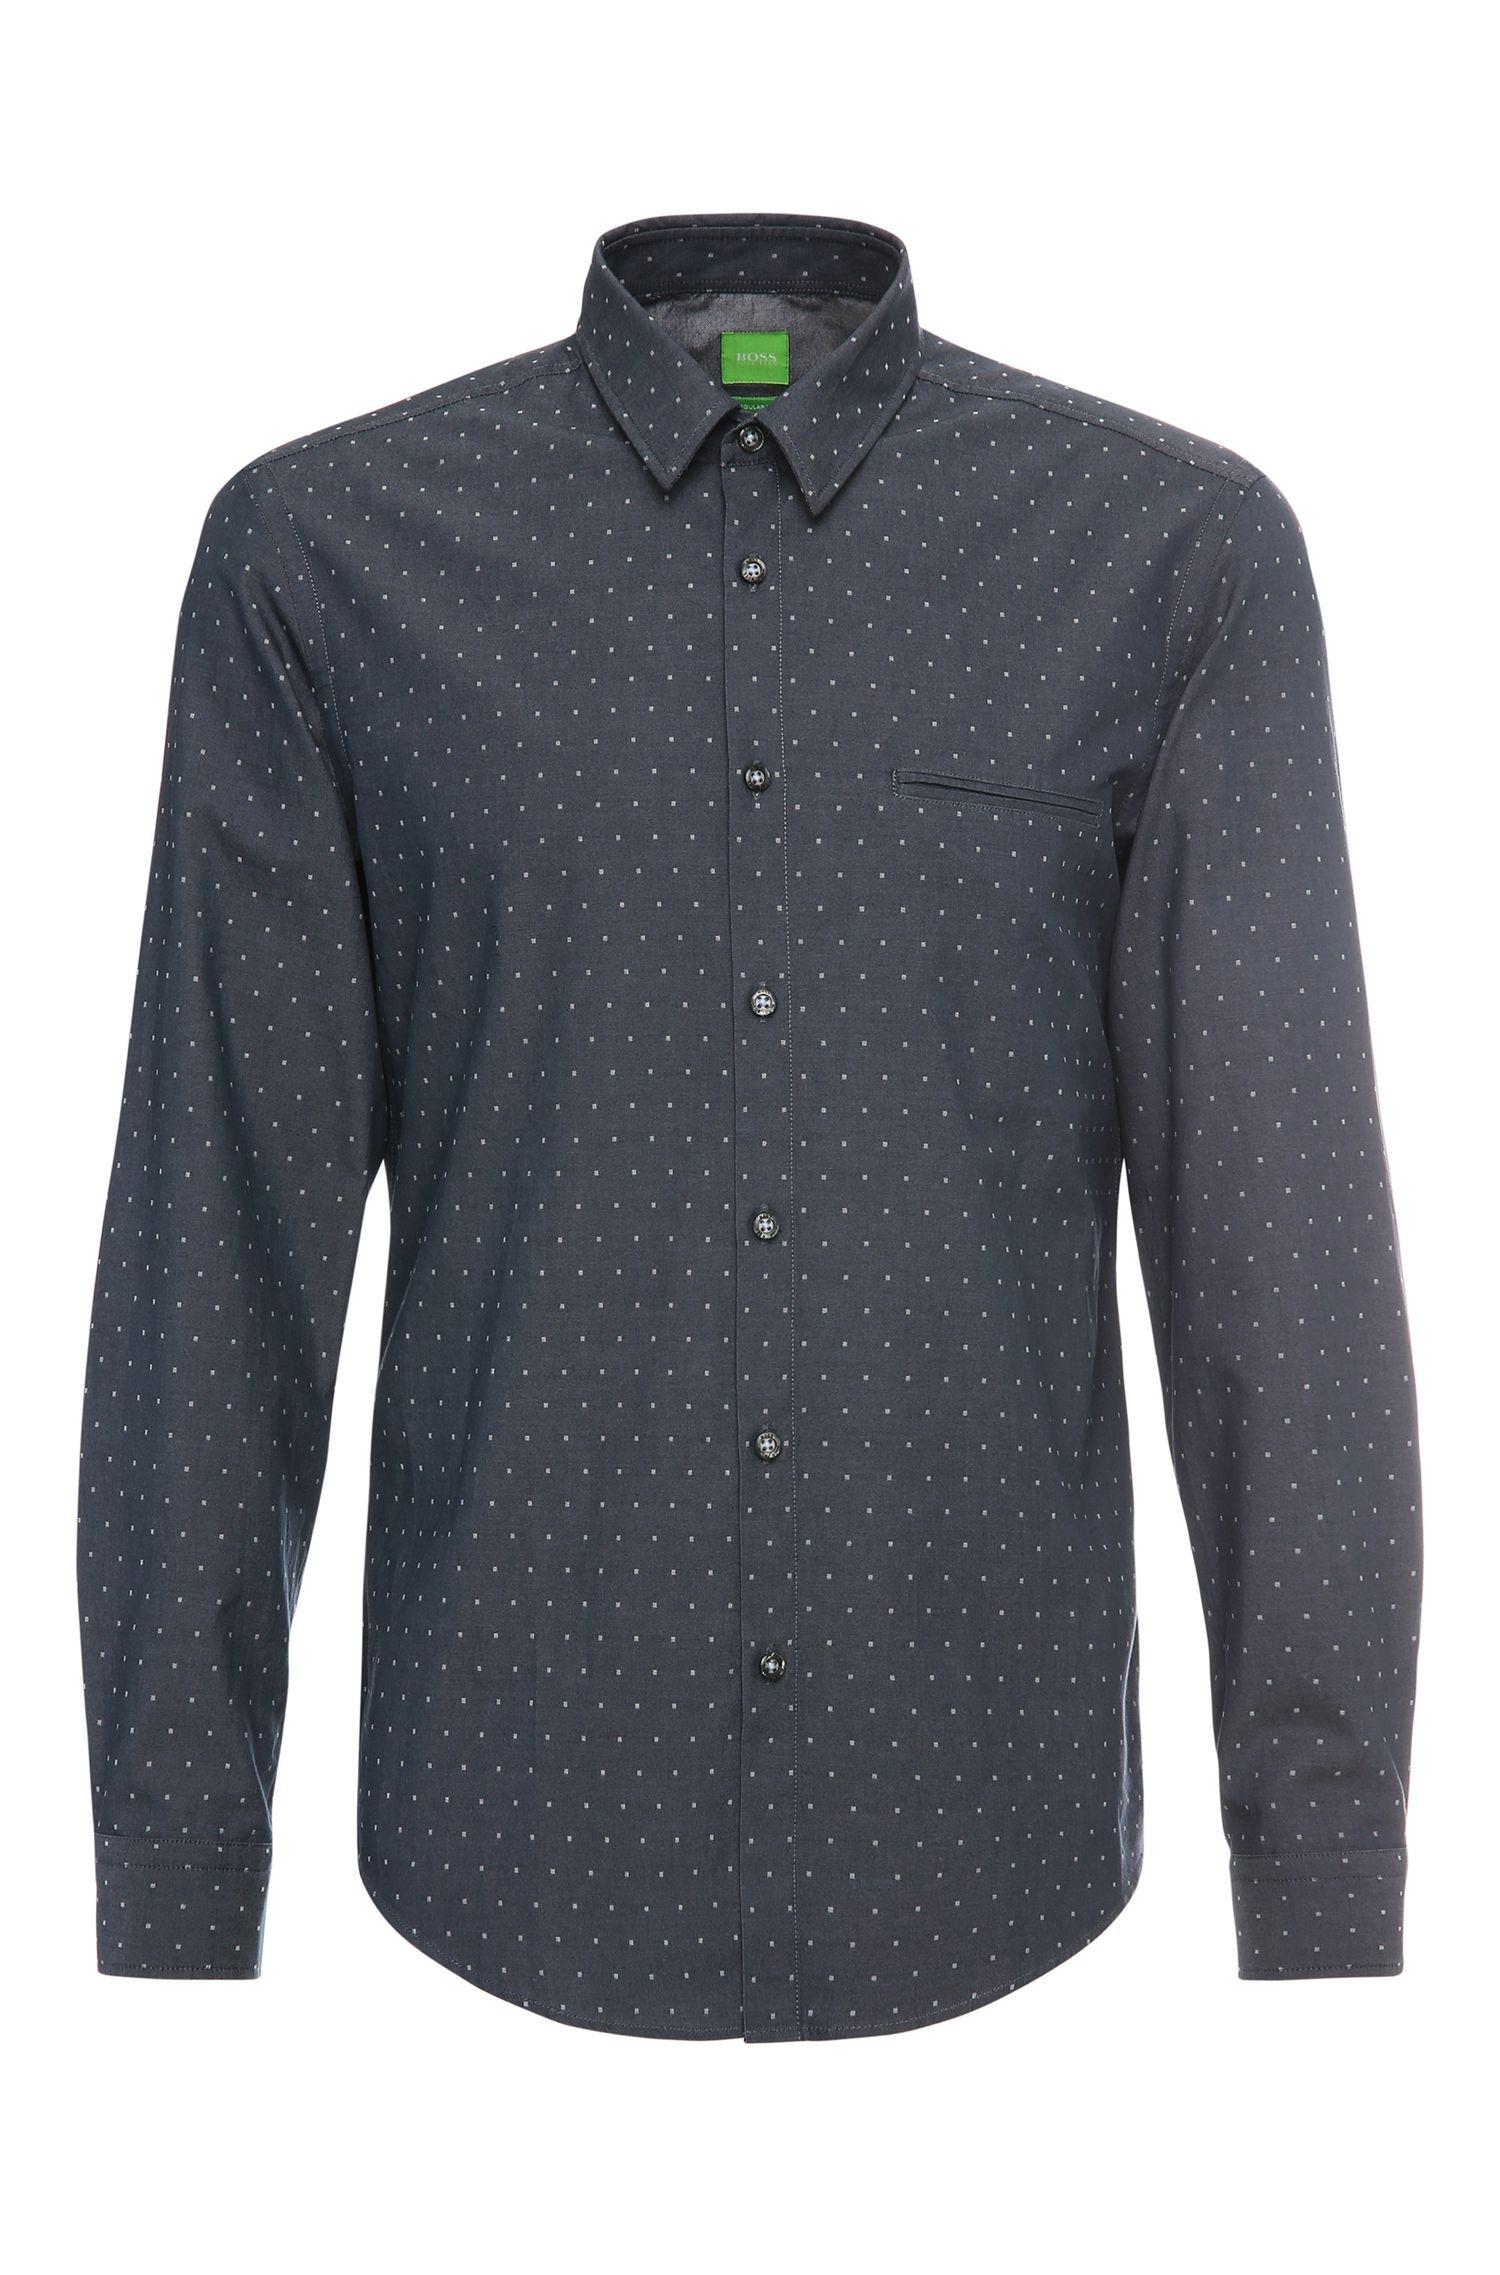 'C-Bacchis' | Regular Fit, Cotton Dot Button Down Shirt